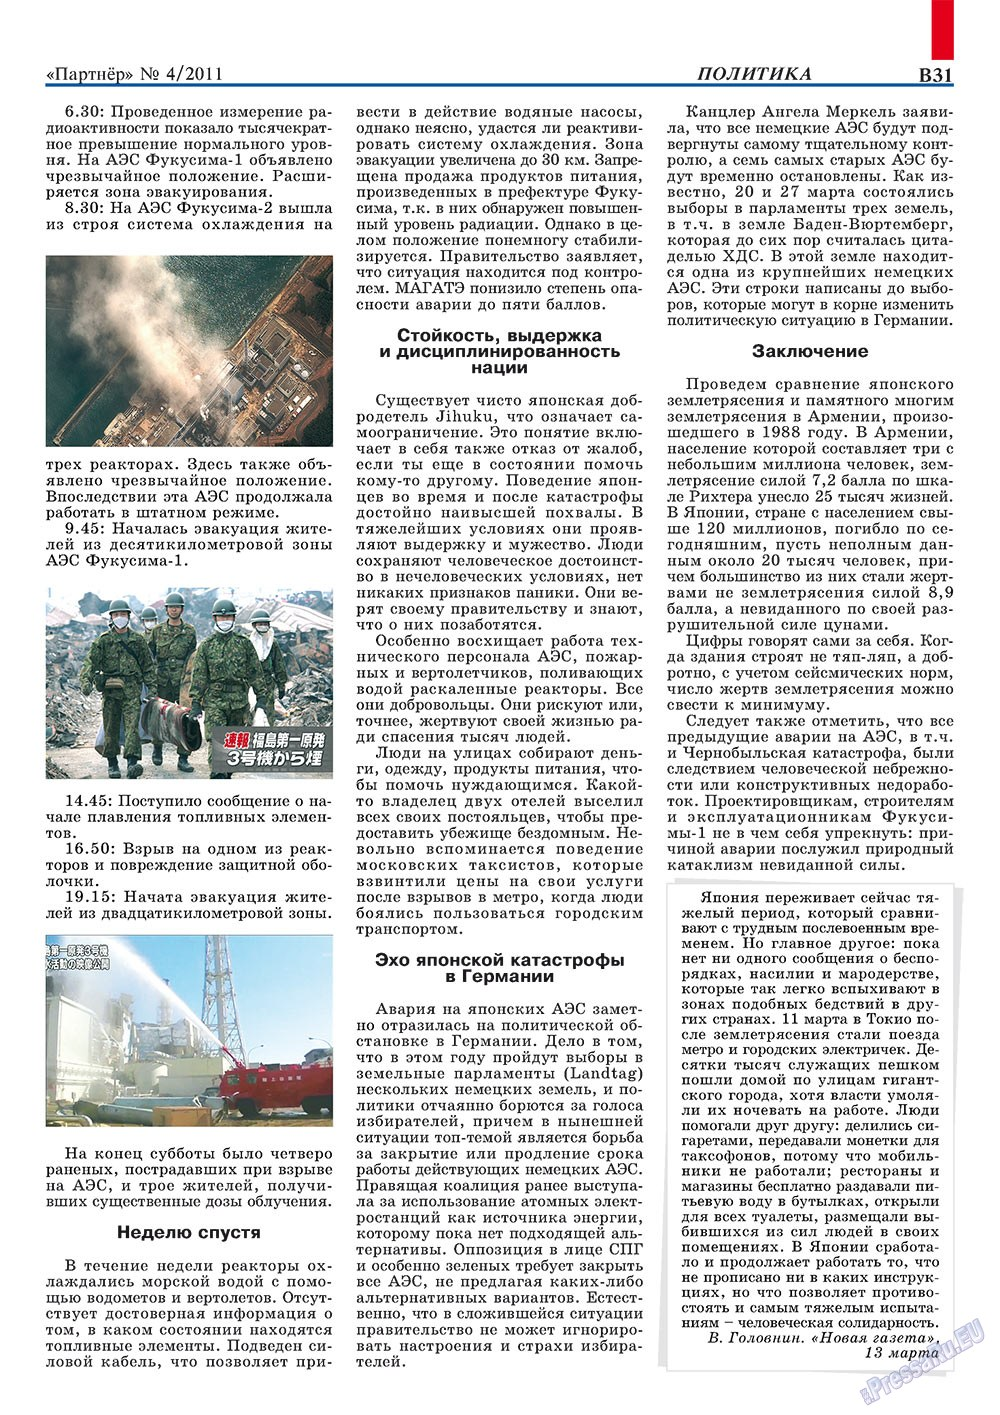 Партнер-север (журнал). 2011 год, номер 4, стр. 41